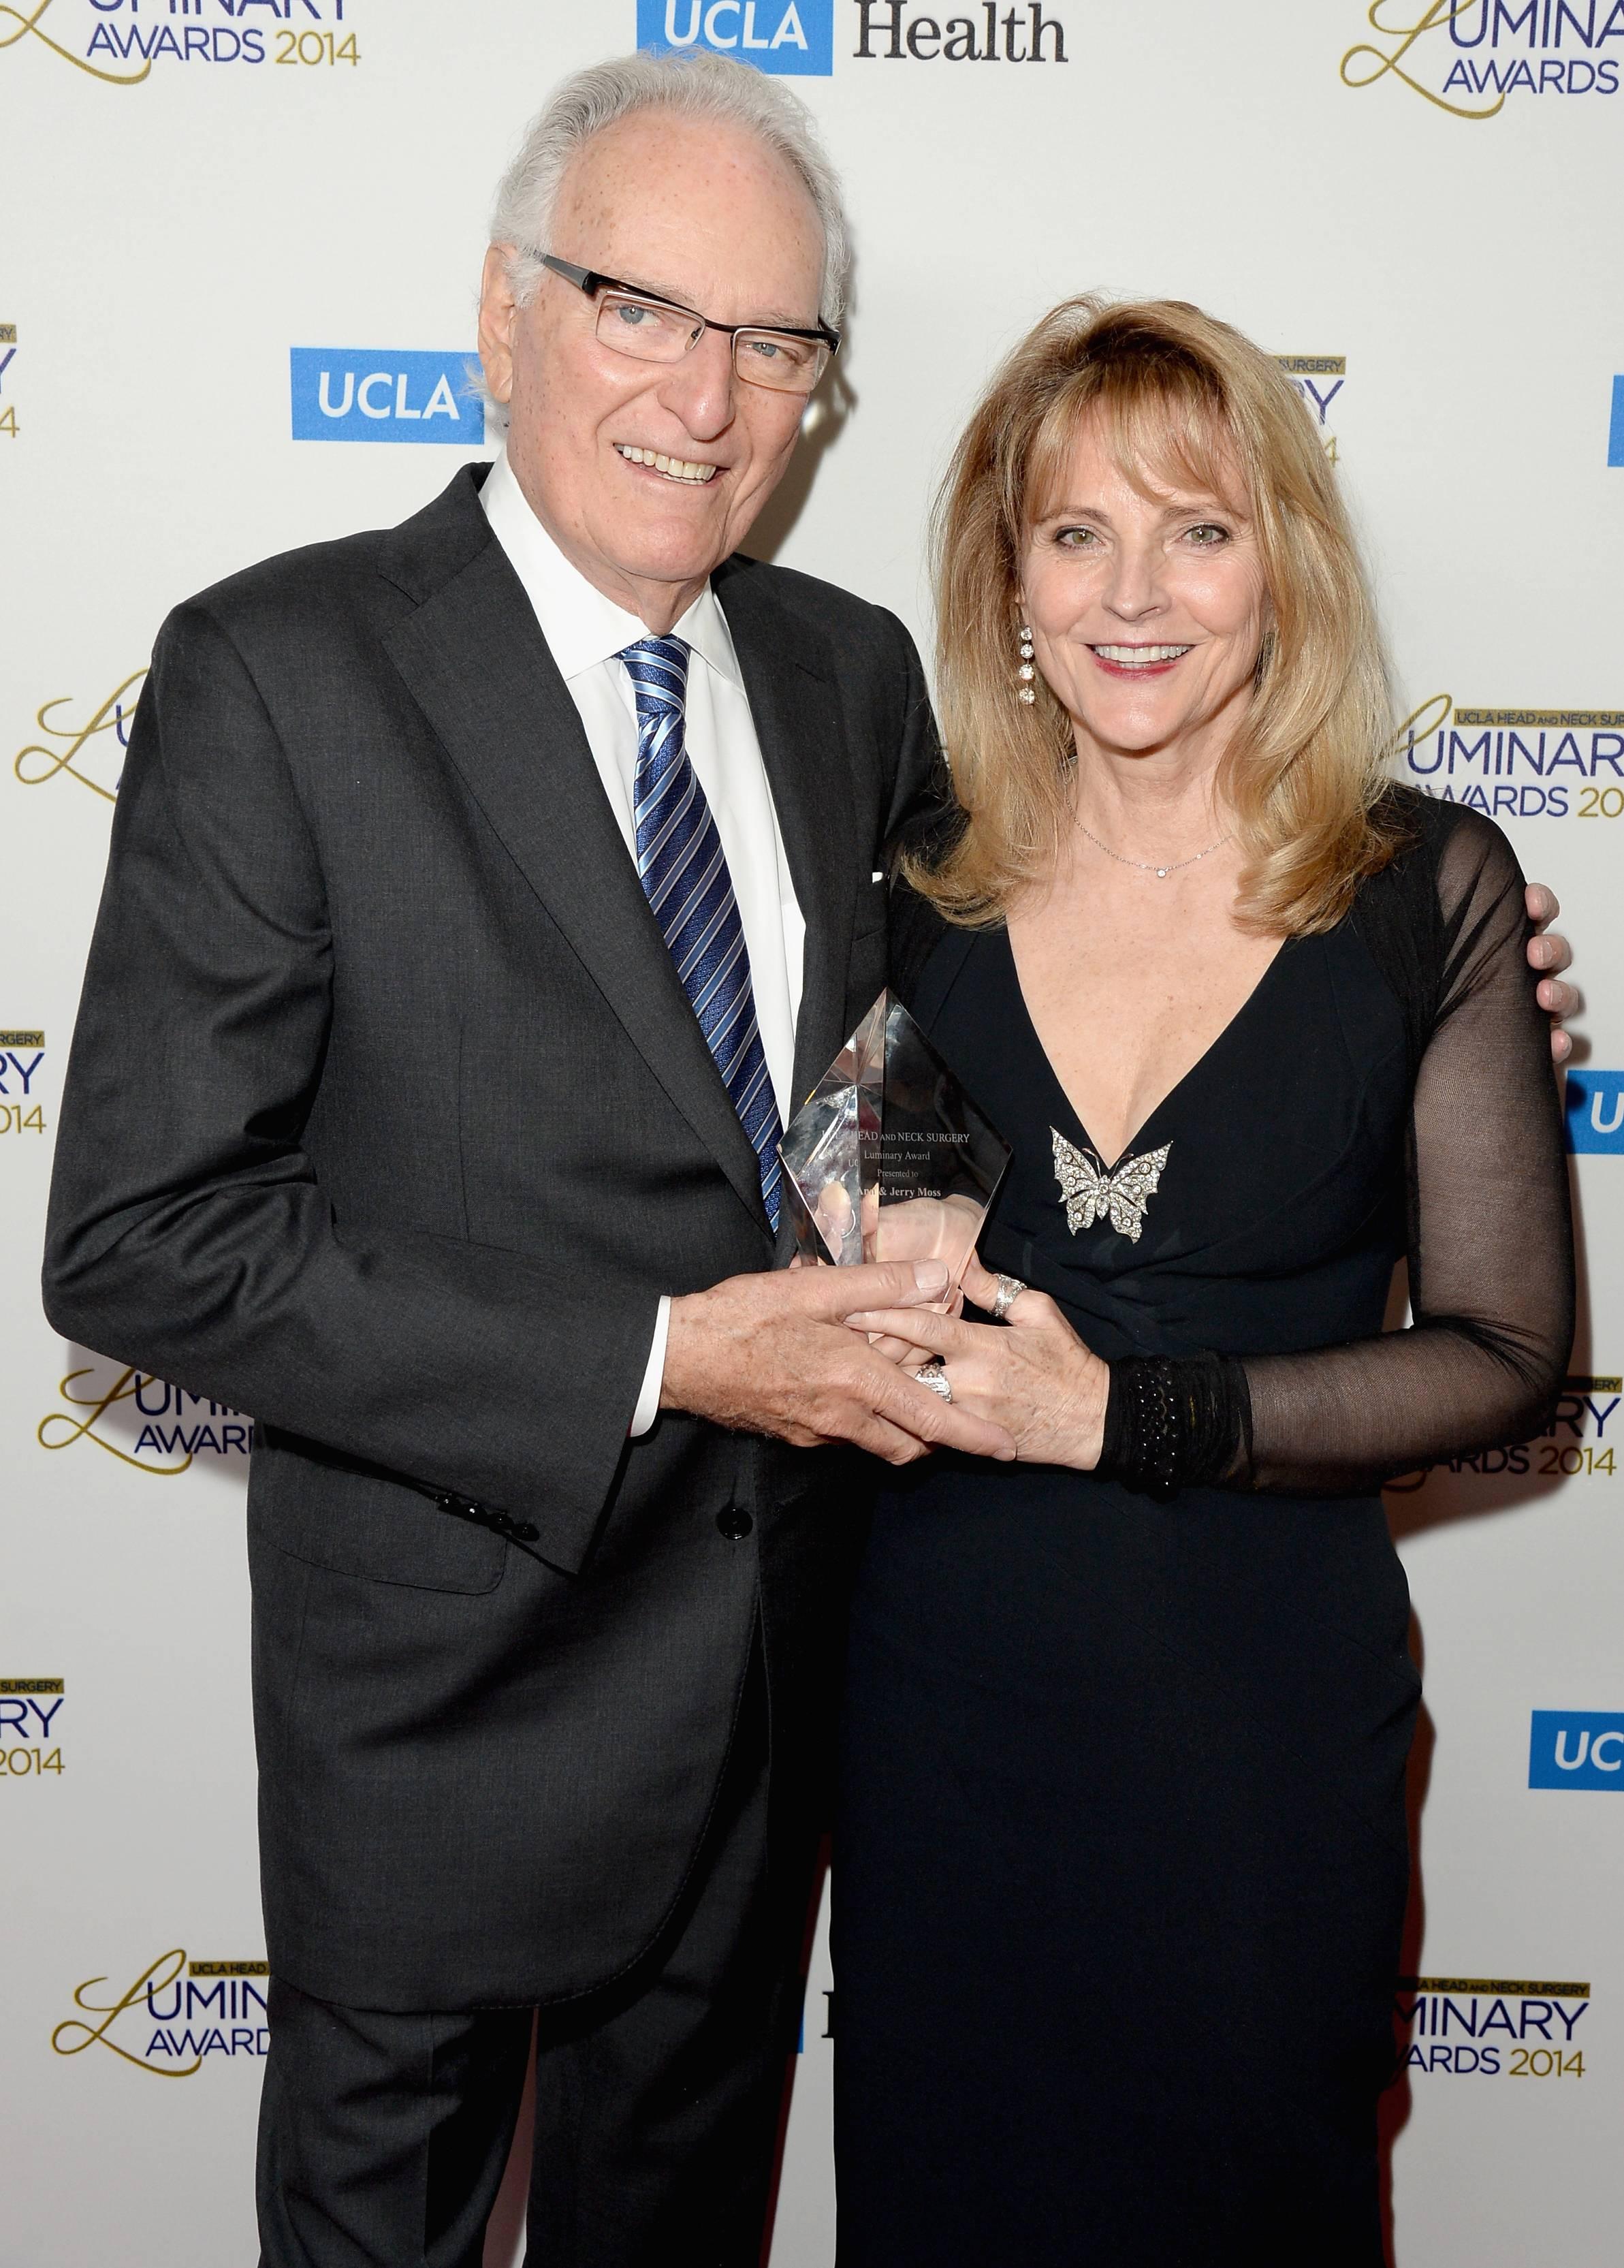 UCLA Head And Neck Surgery Luminary Awards - Red Carpet